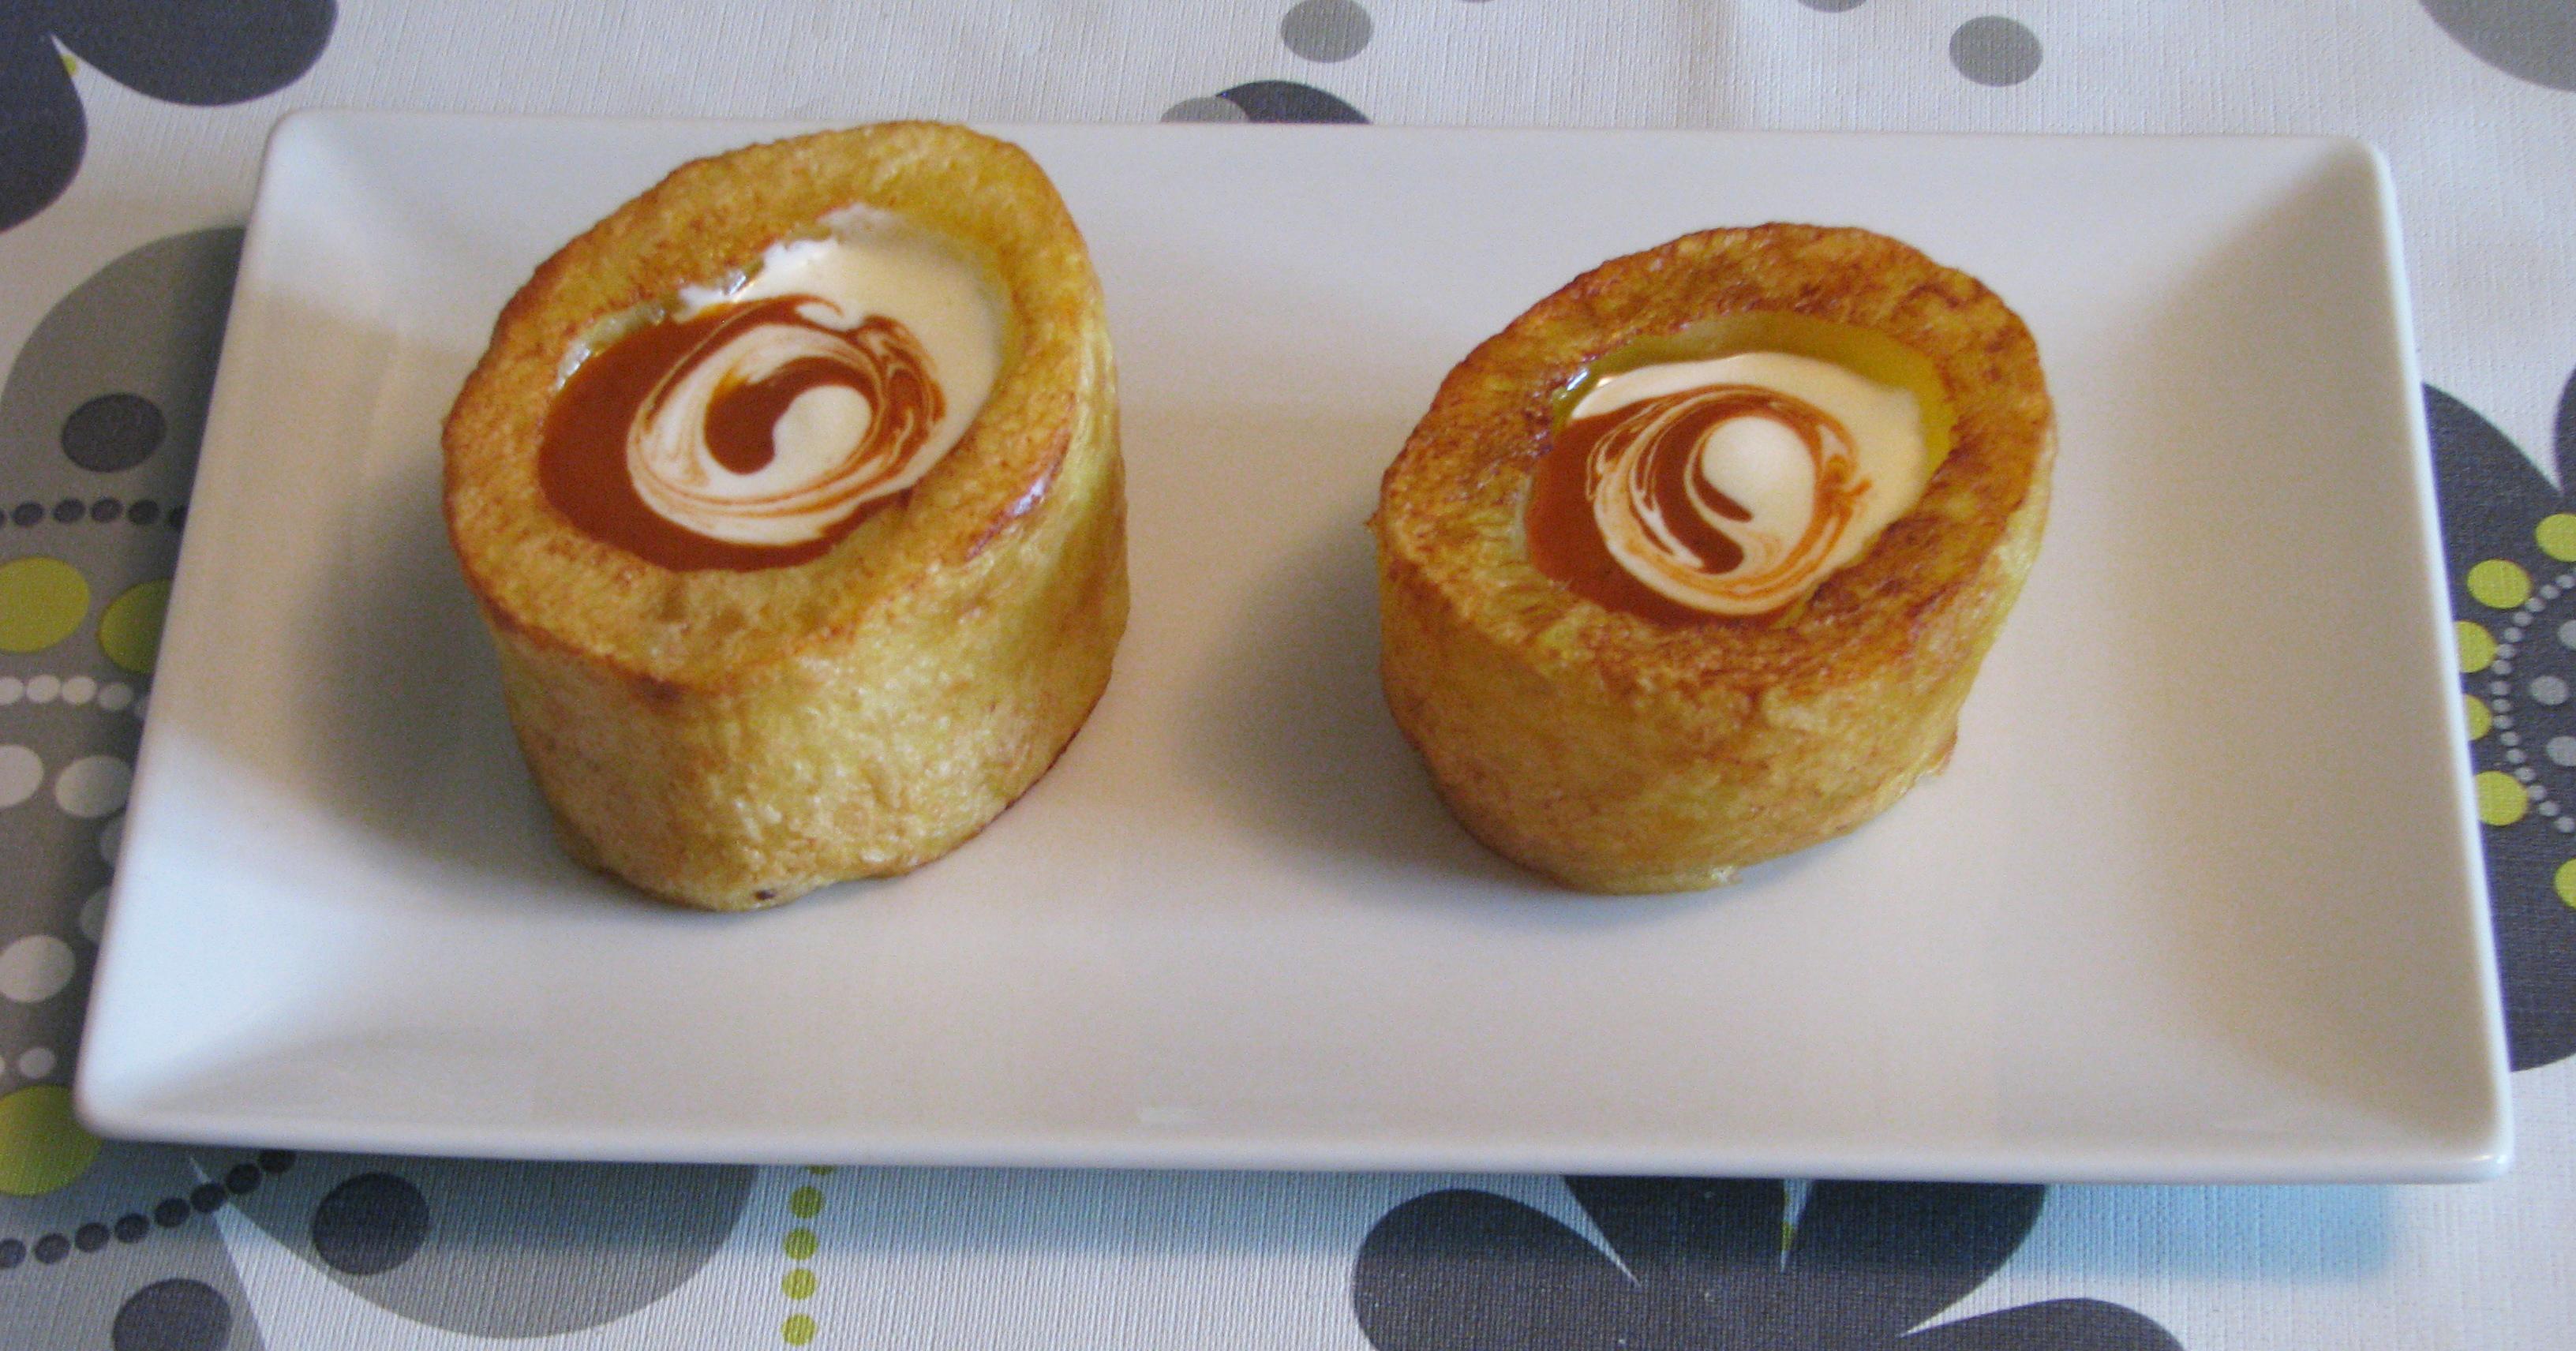 Barquitas de patatas bravas